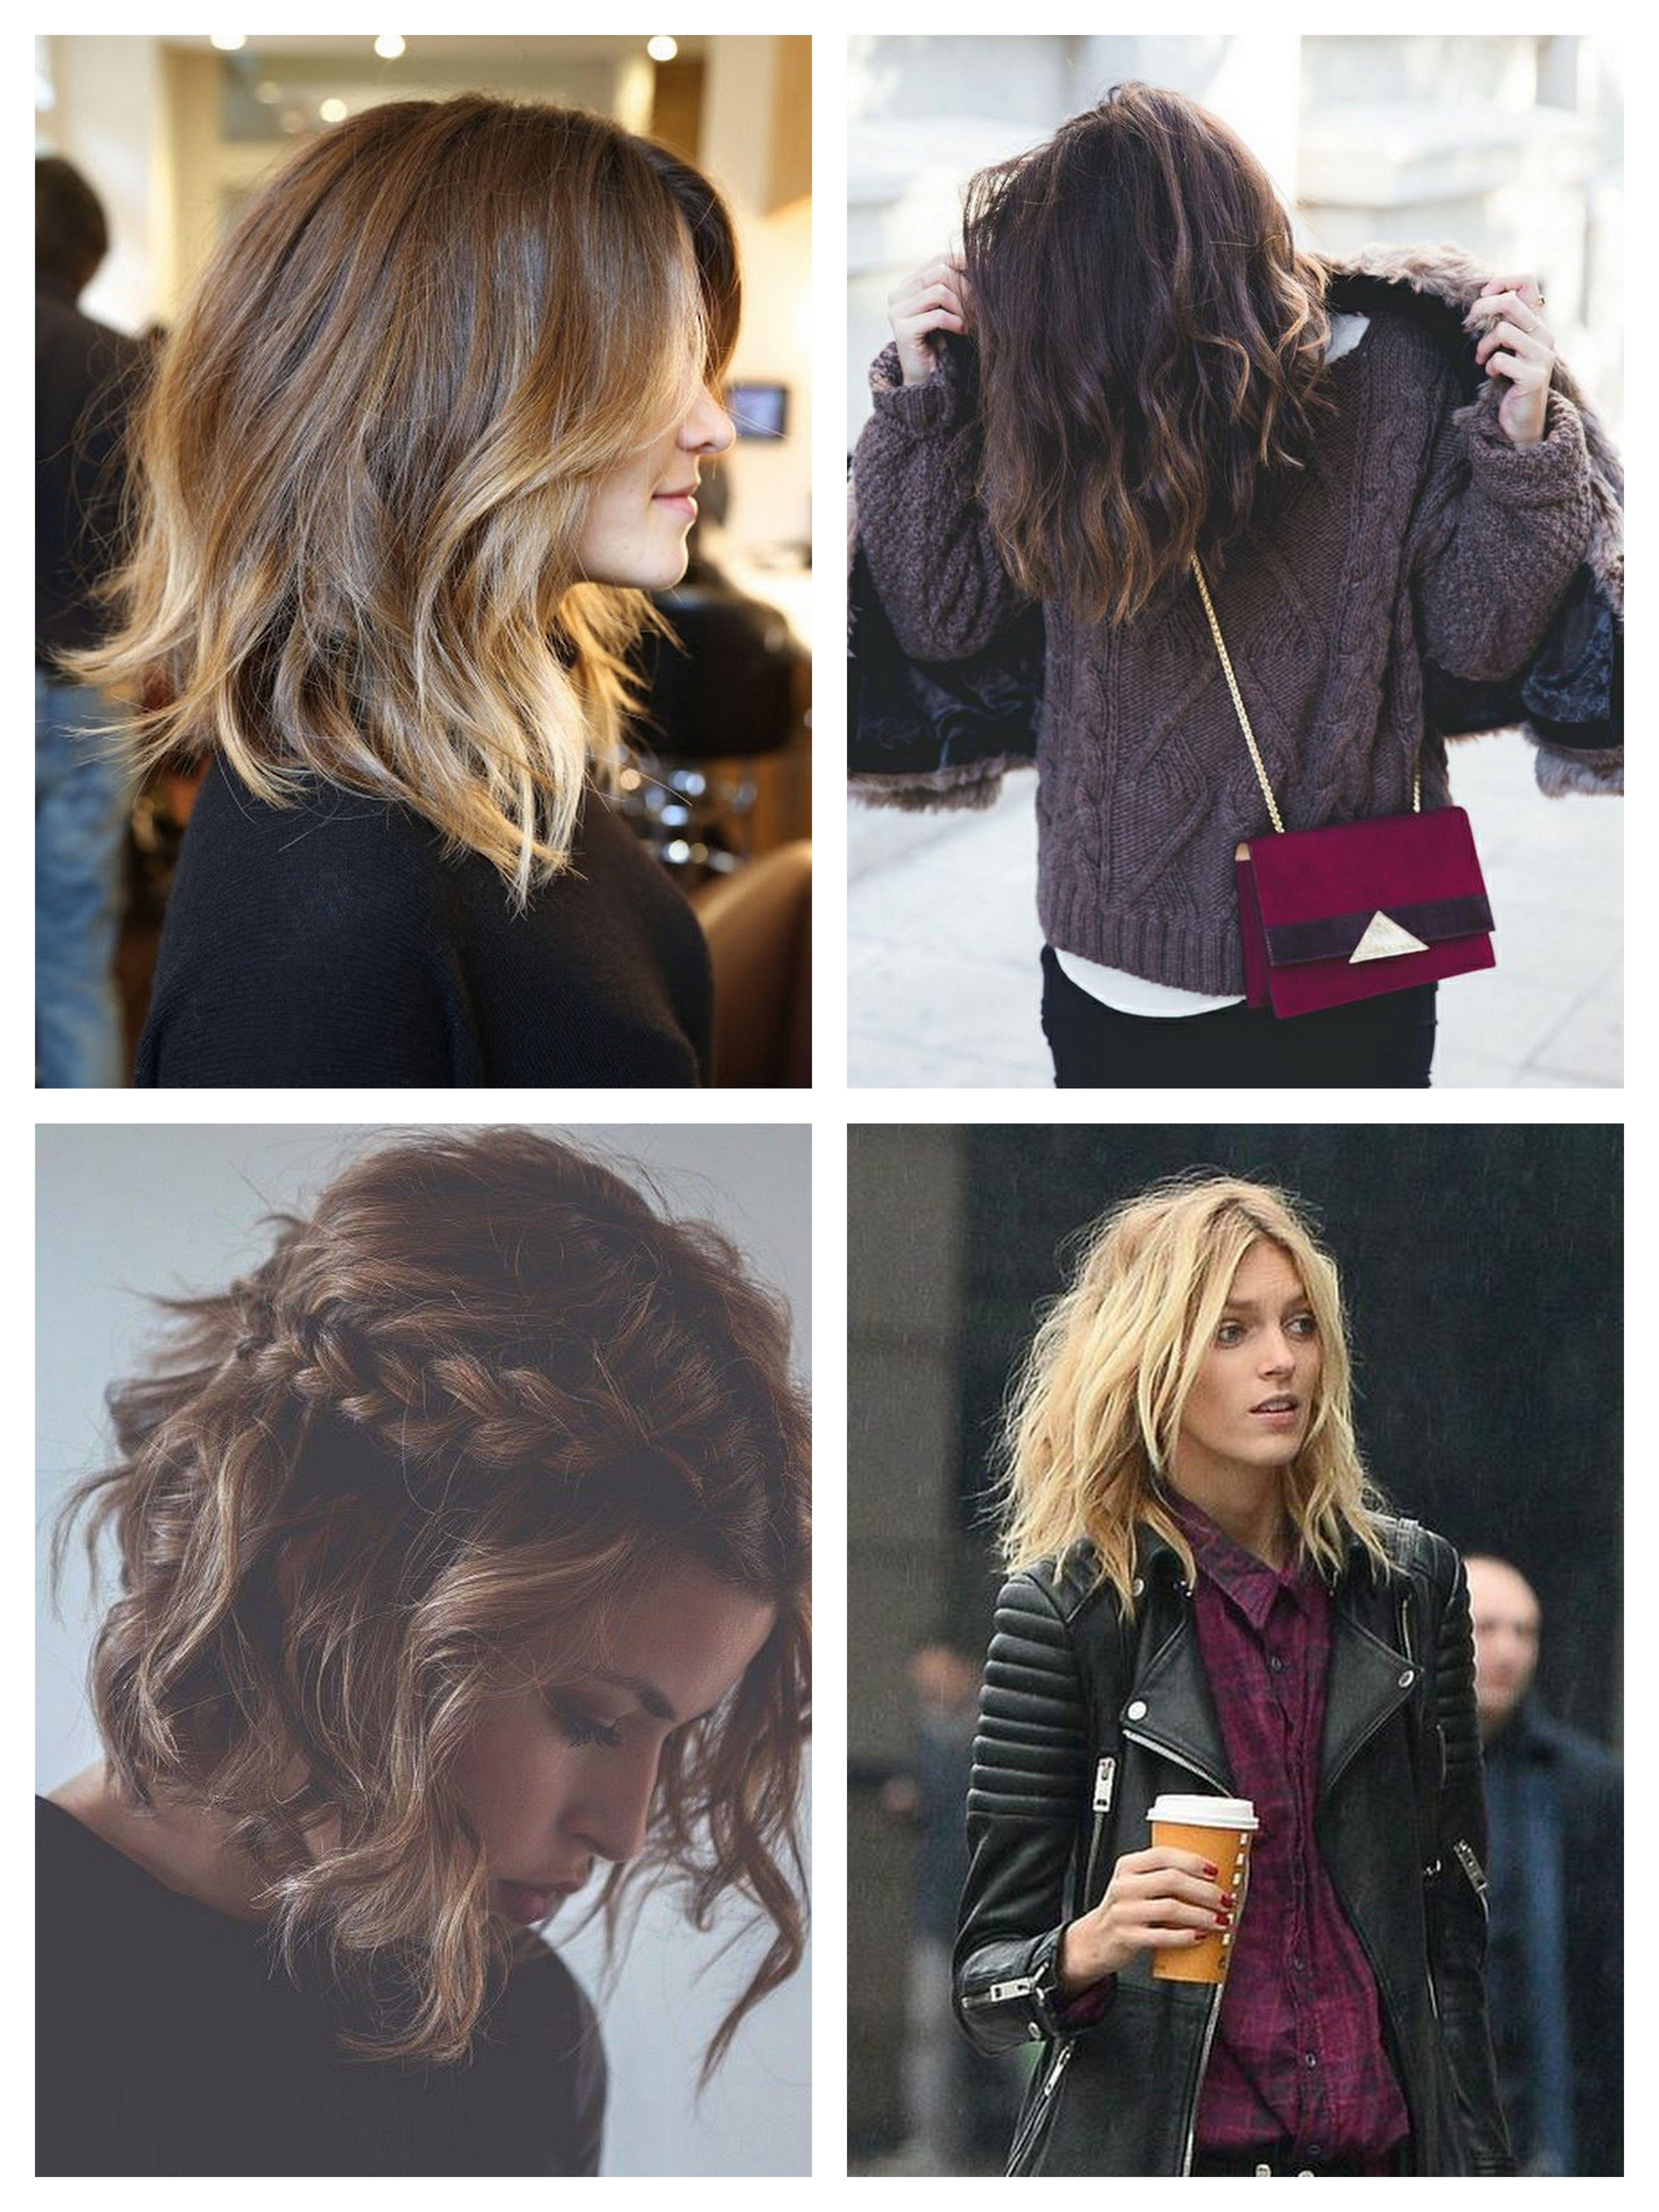 The Long Bob Hairstyles Pinterest Hair Hair Styles And Long Bob